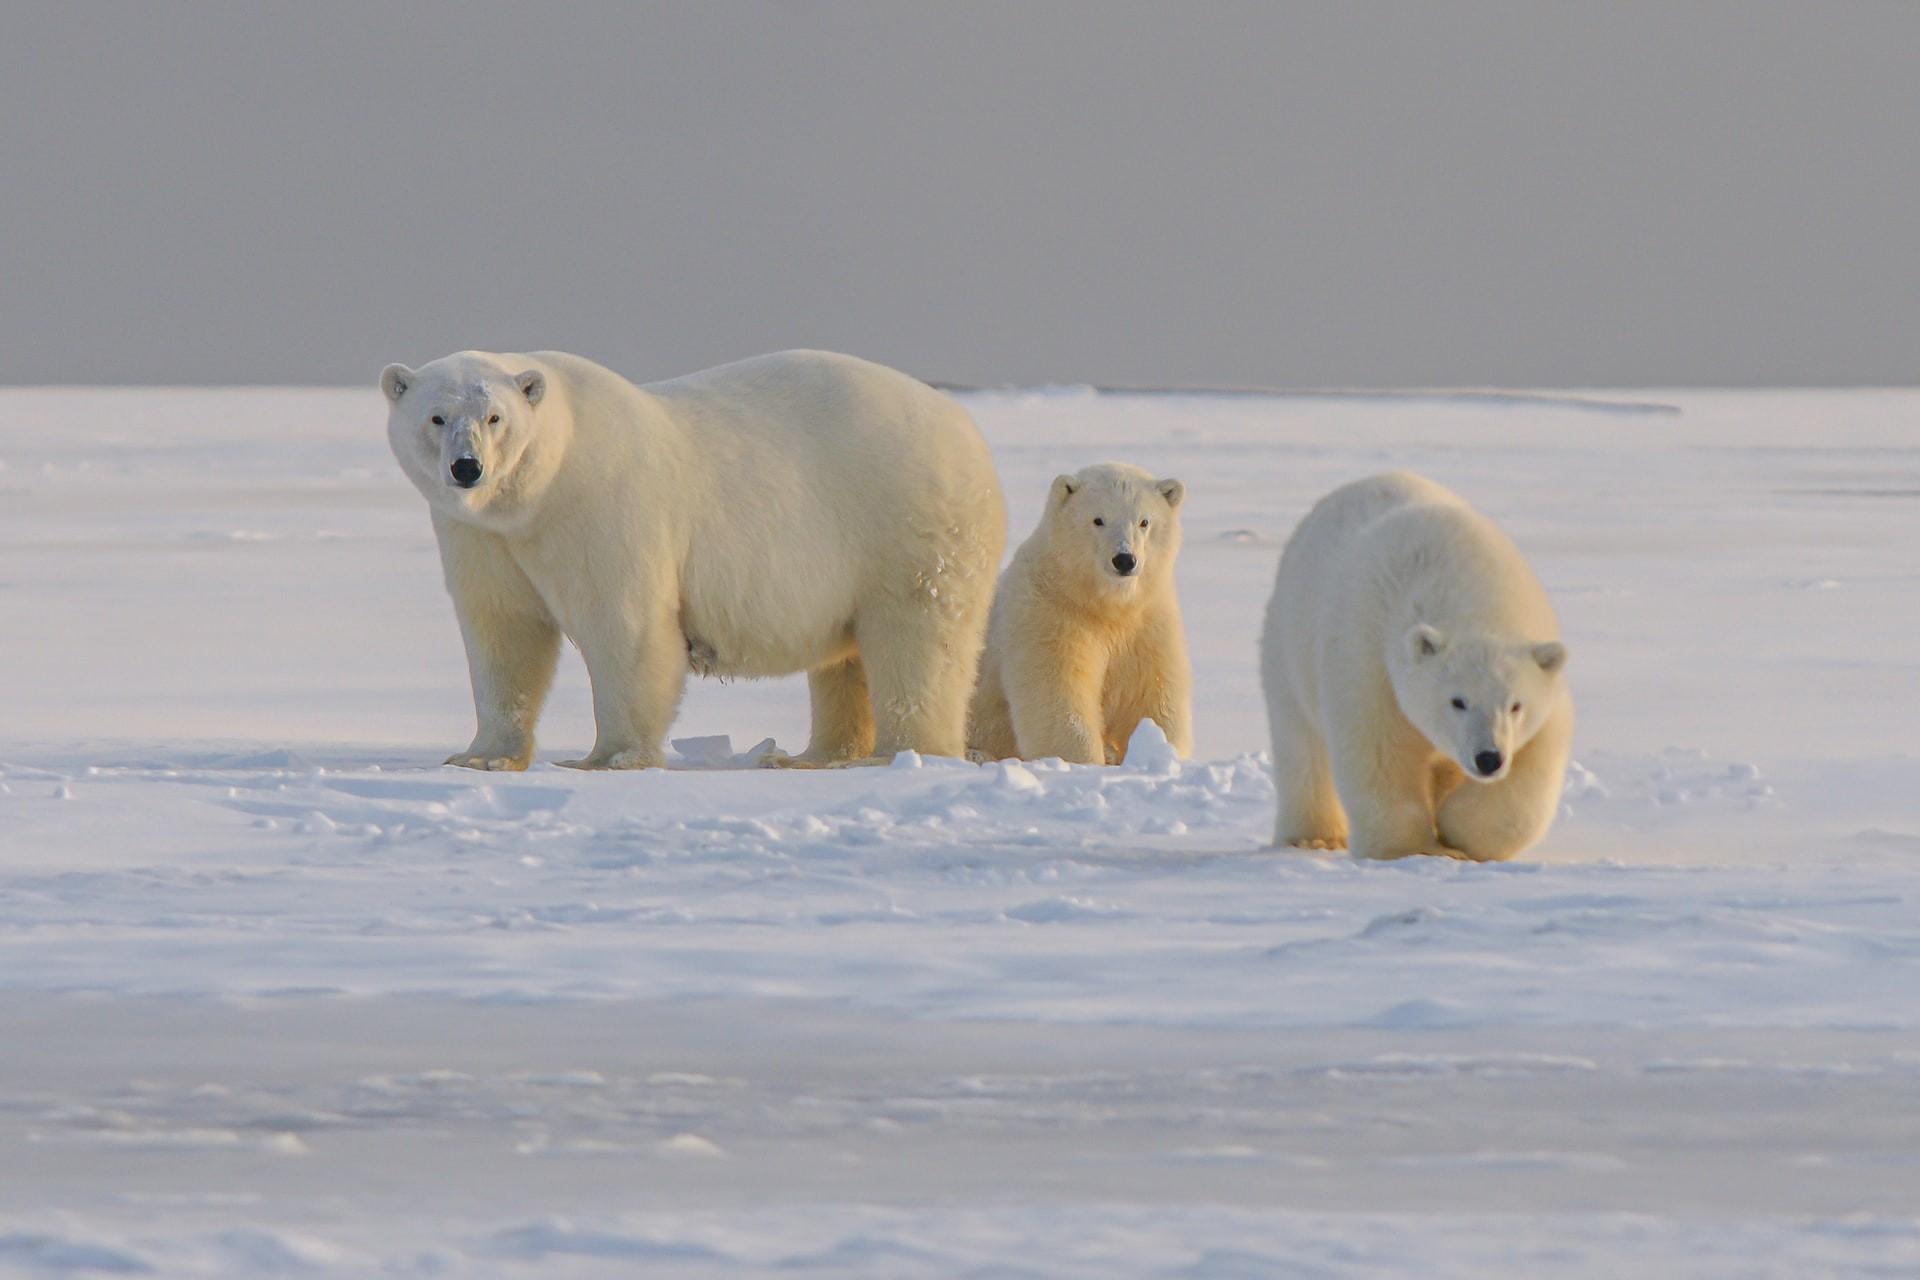 Three polar bears walk across the snow in the Arctic tundra.